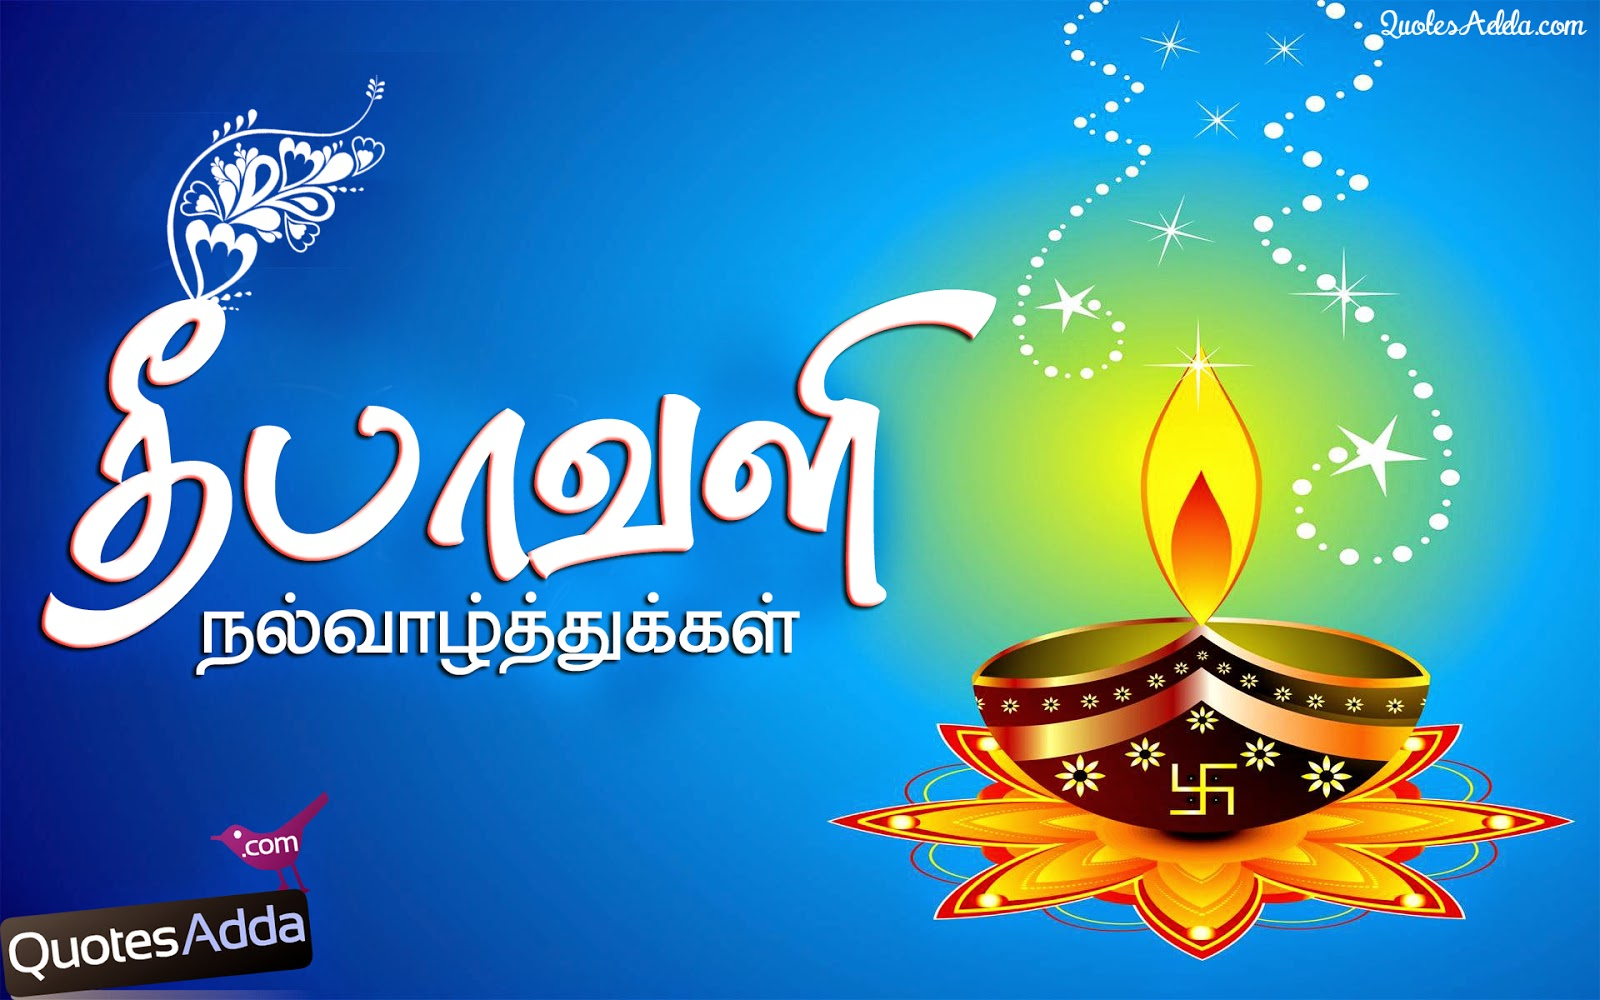 Deepavali greetings in tamil download calmly talents deepavali greetings in tamil download m4hsunfo